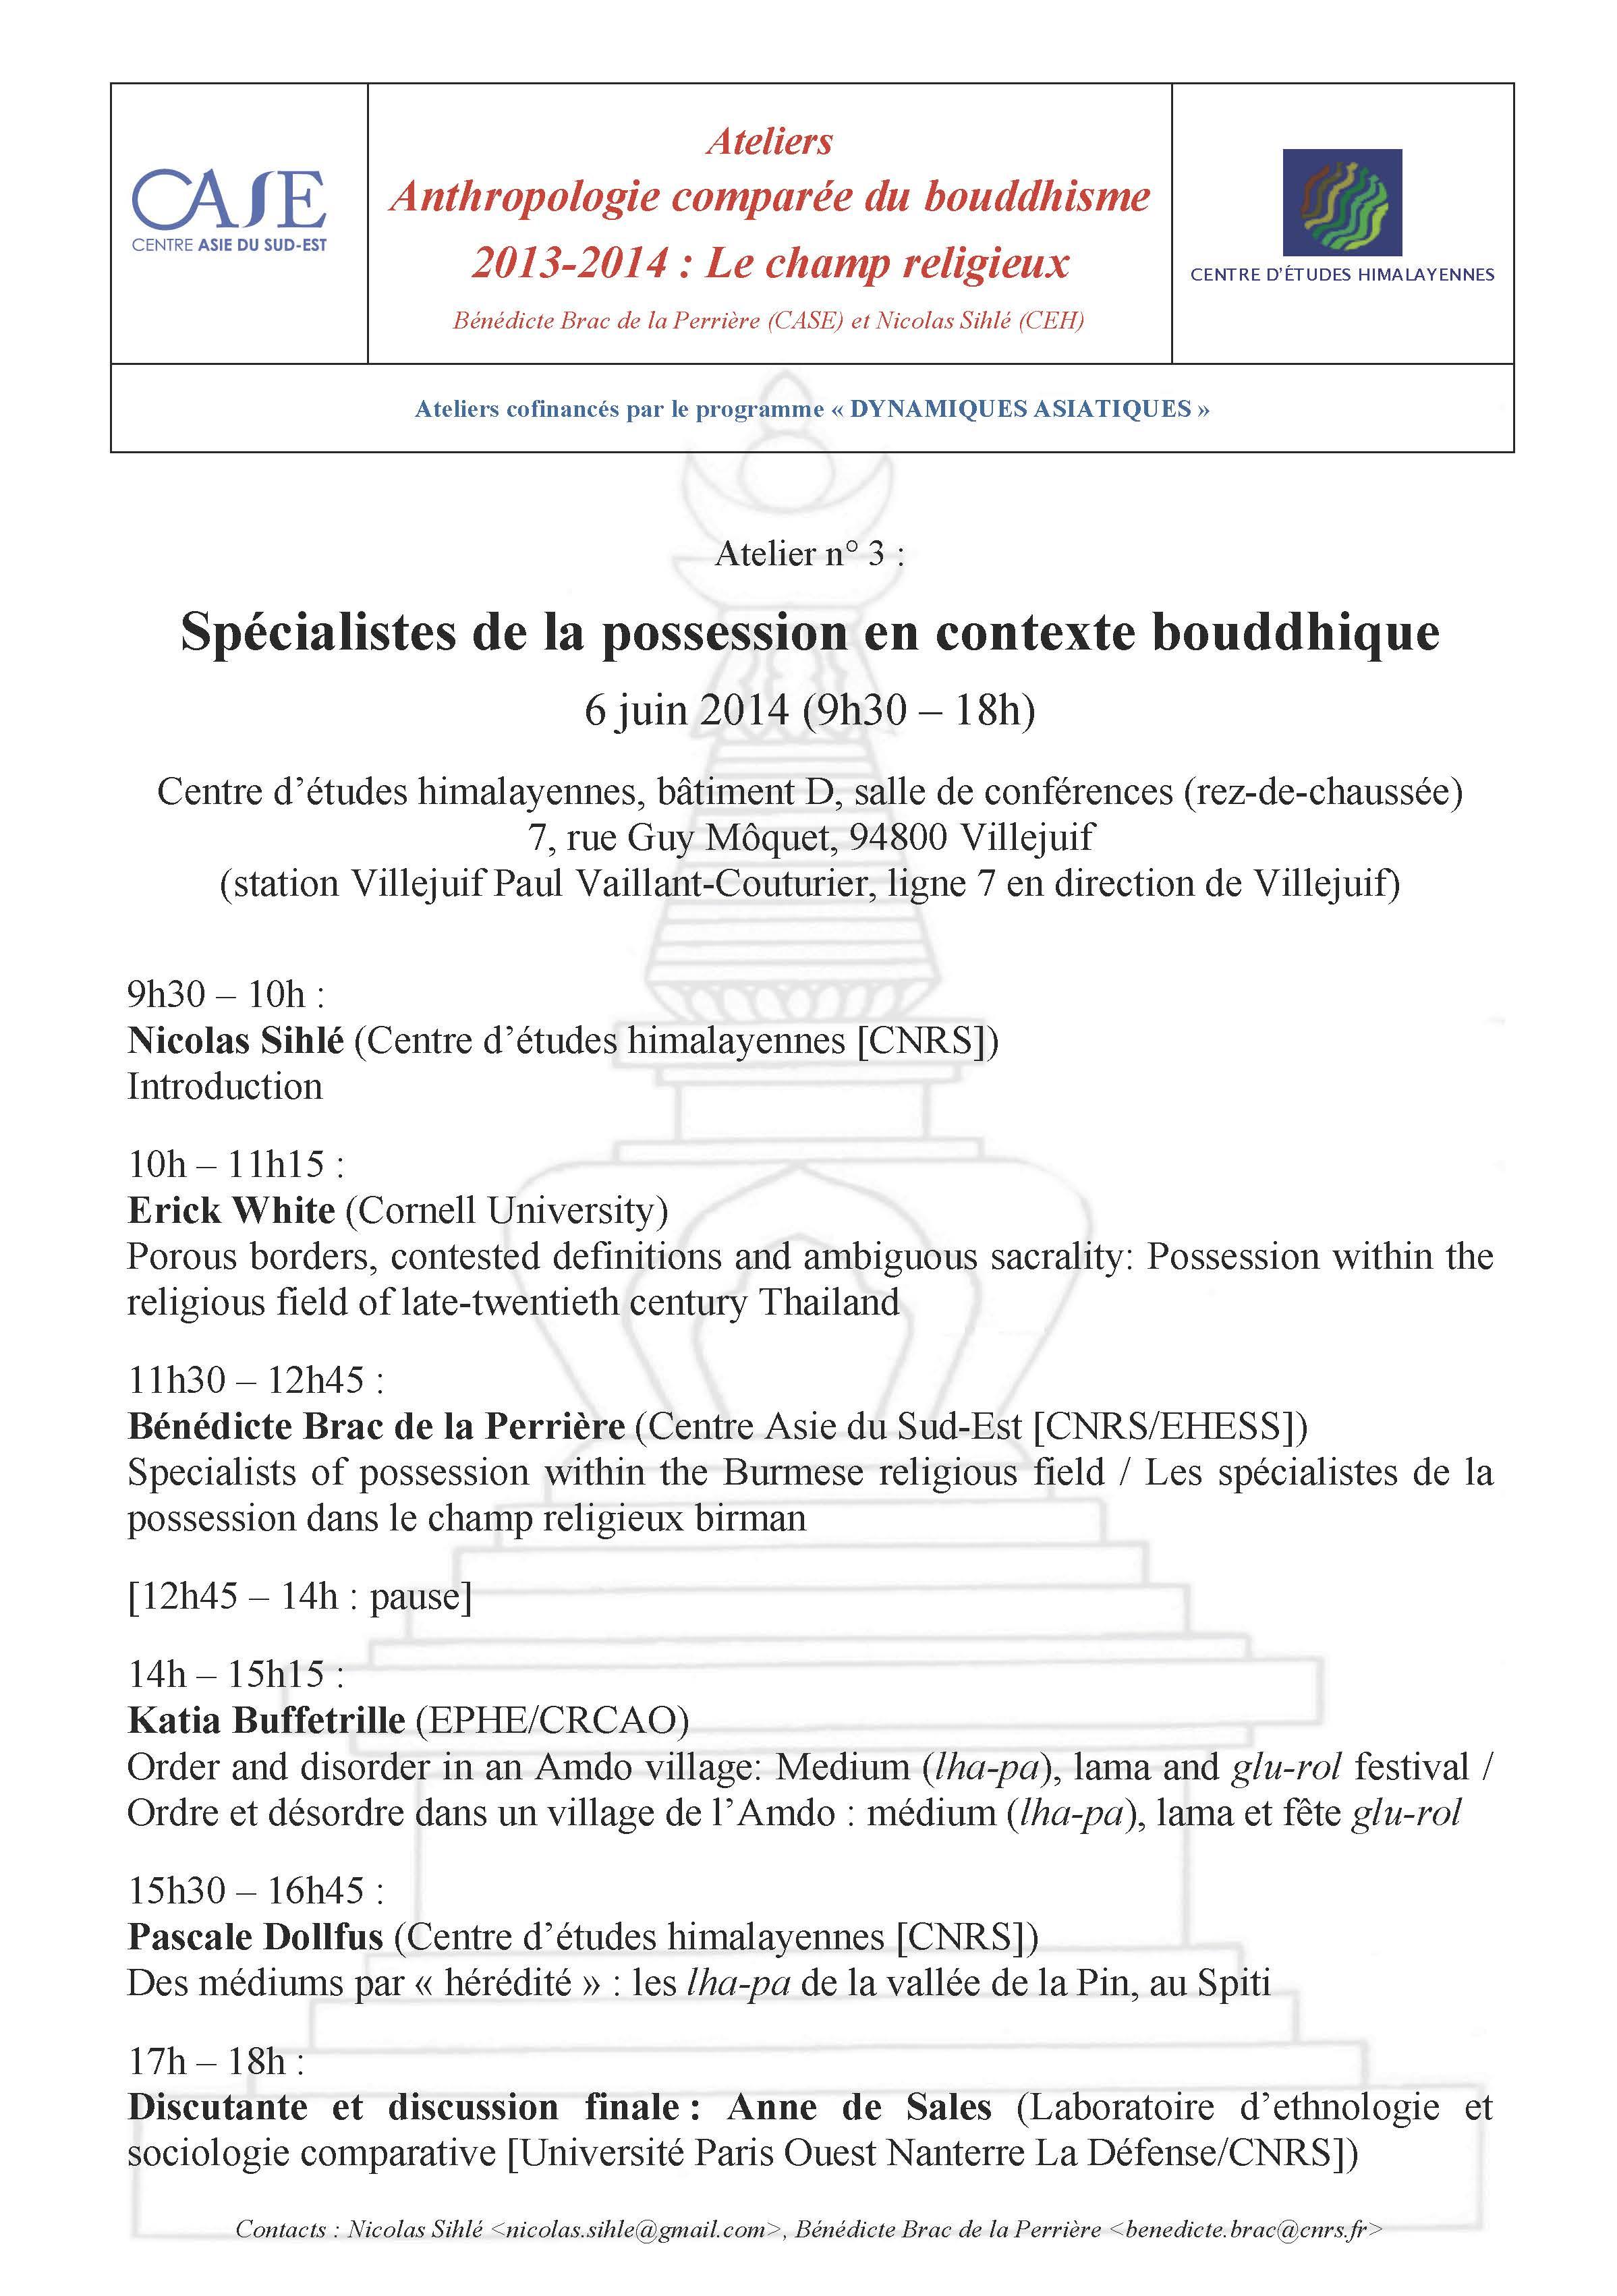 ProgrammeAtelier2.3_SpecialistesPossession_affiche